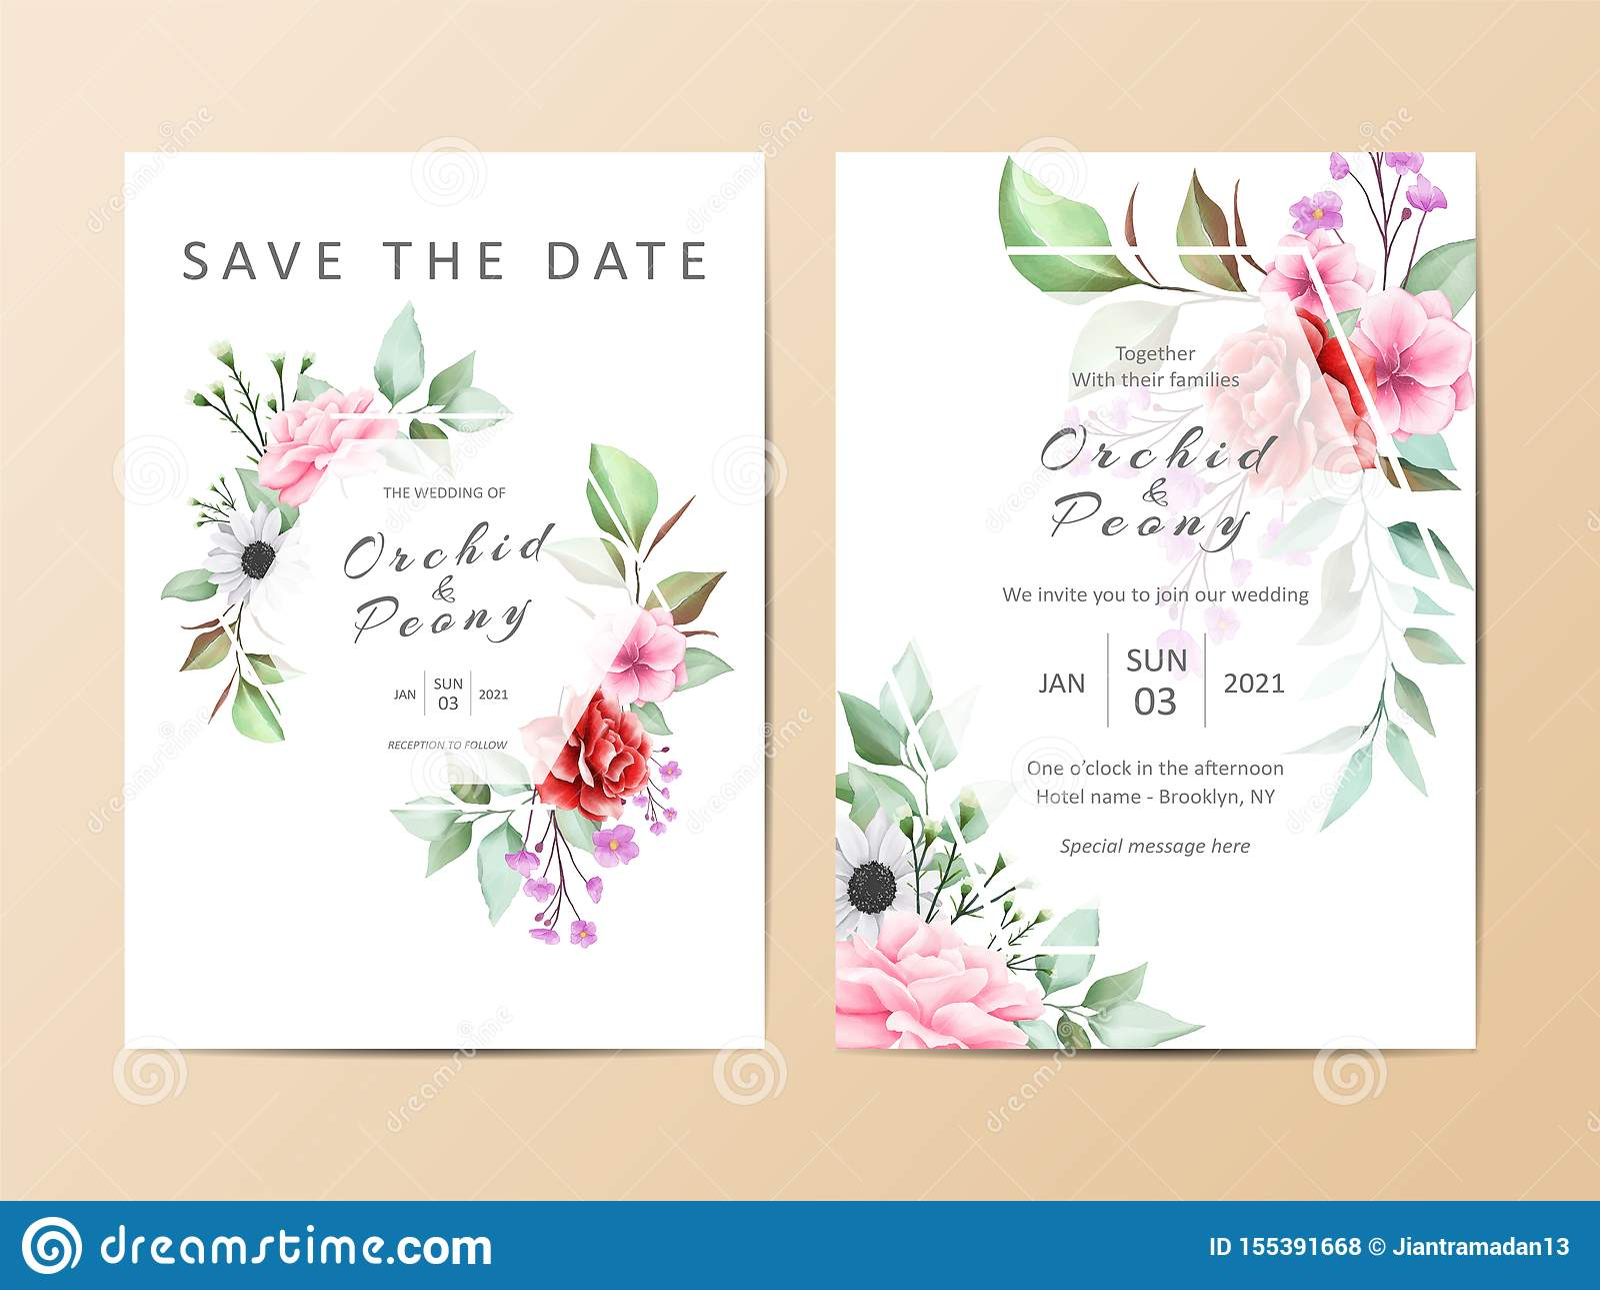 Delicate Watercolor Floral Wedding Invitation Card Template